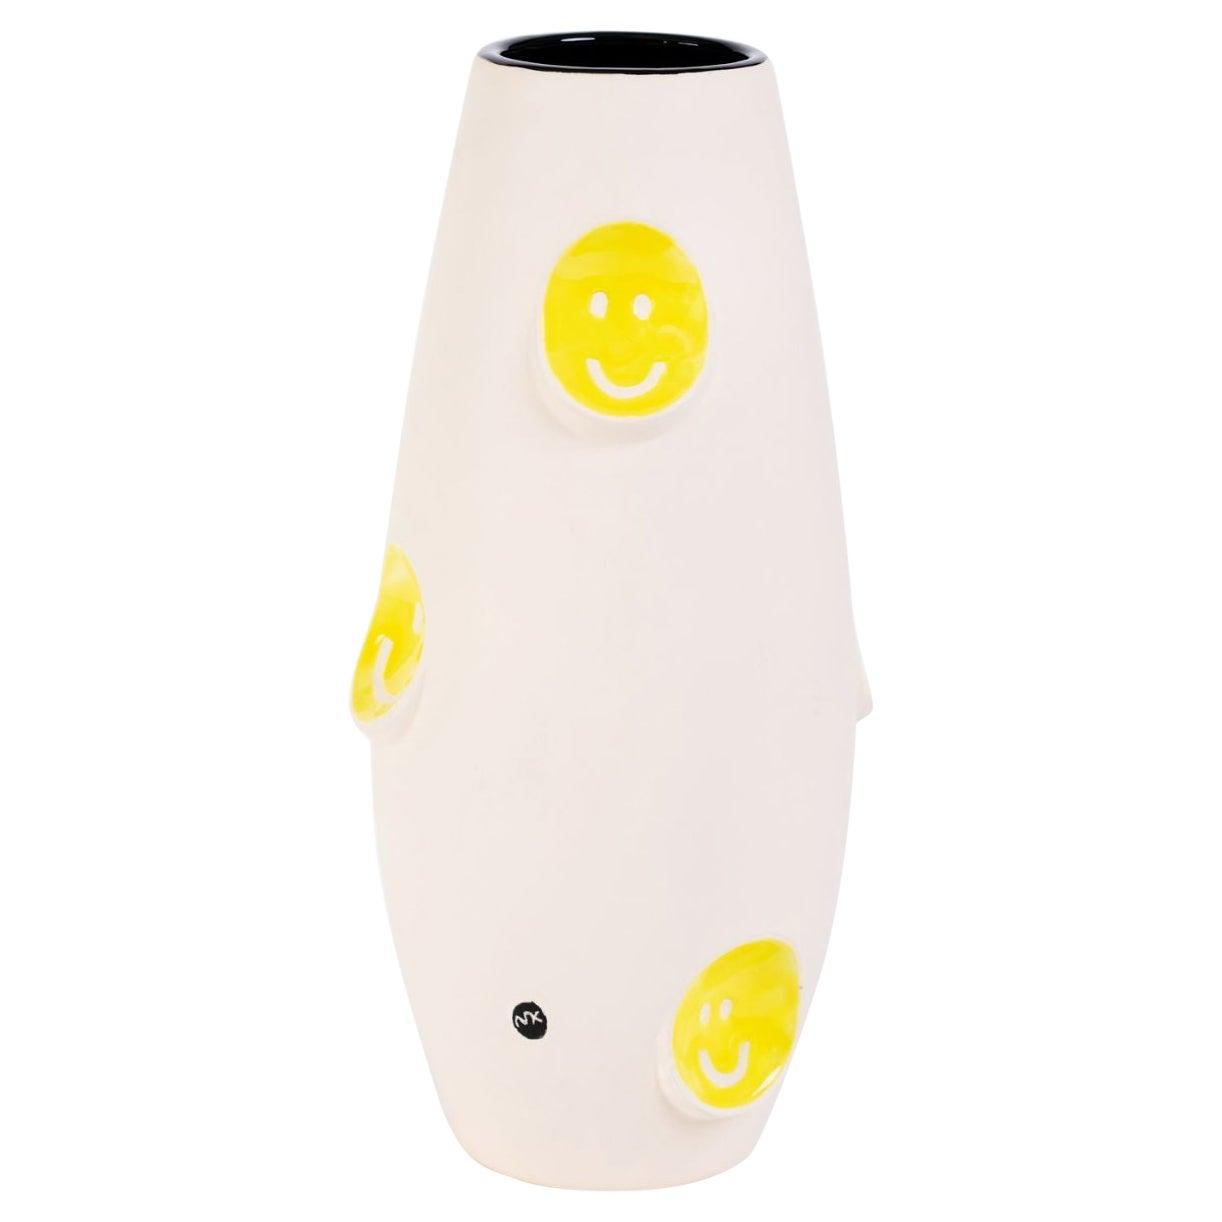 Oko Pop Ceramic Vase, Smiley by Malwina Konopacka